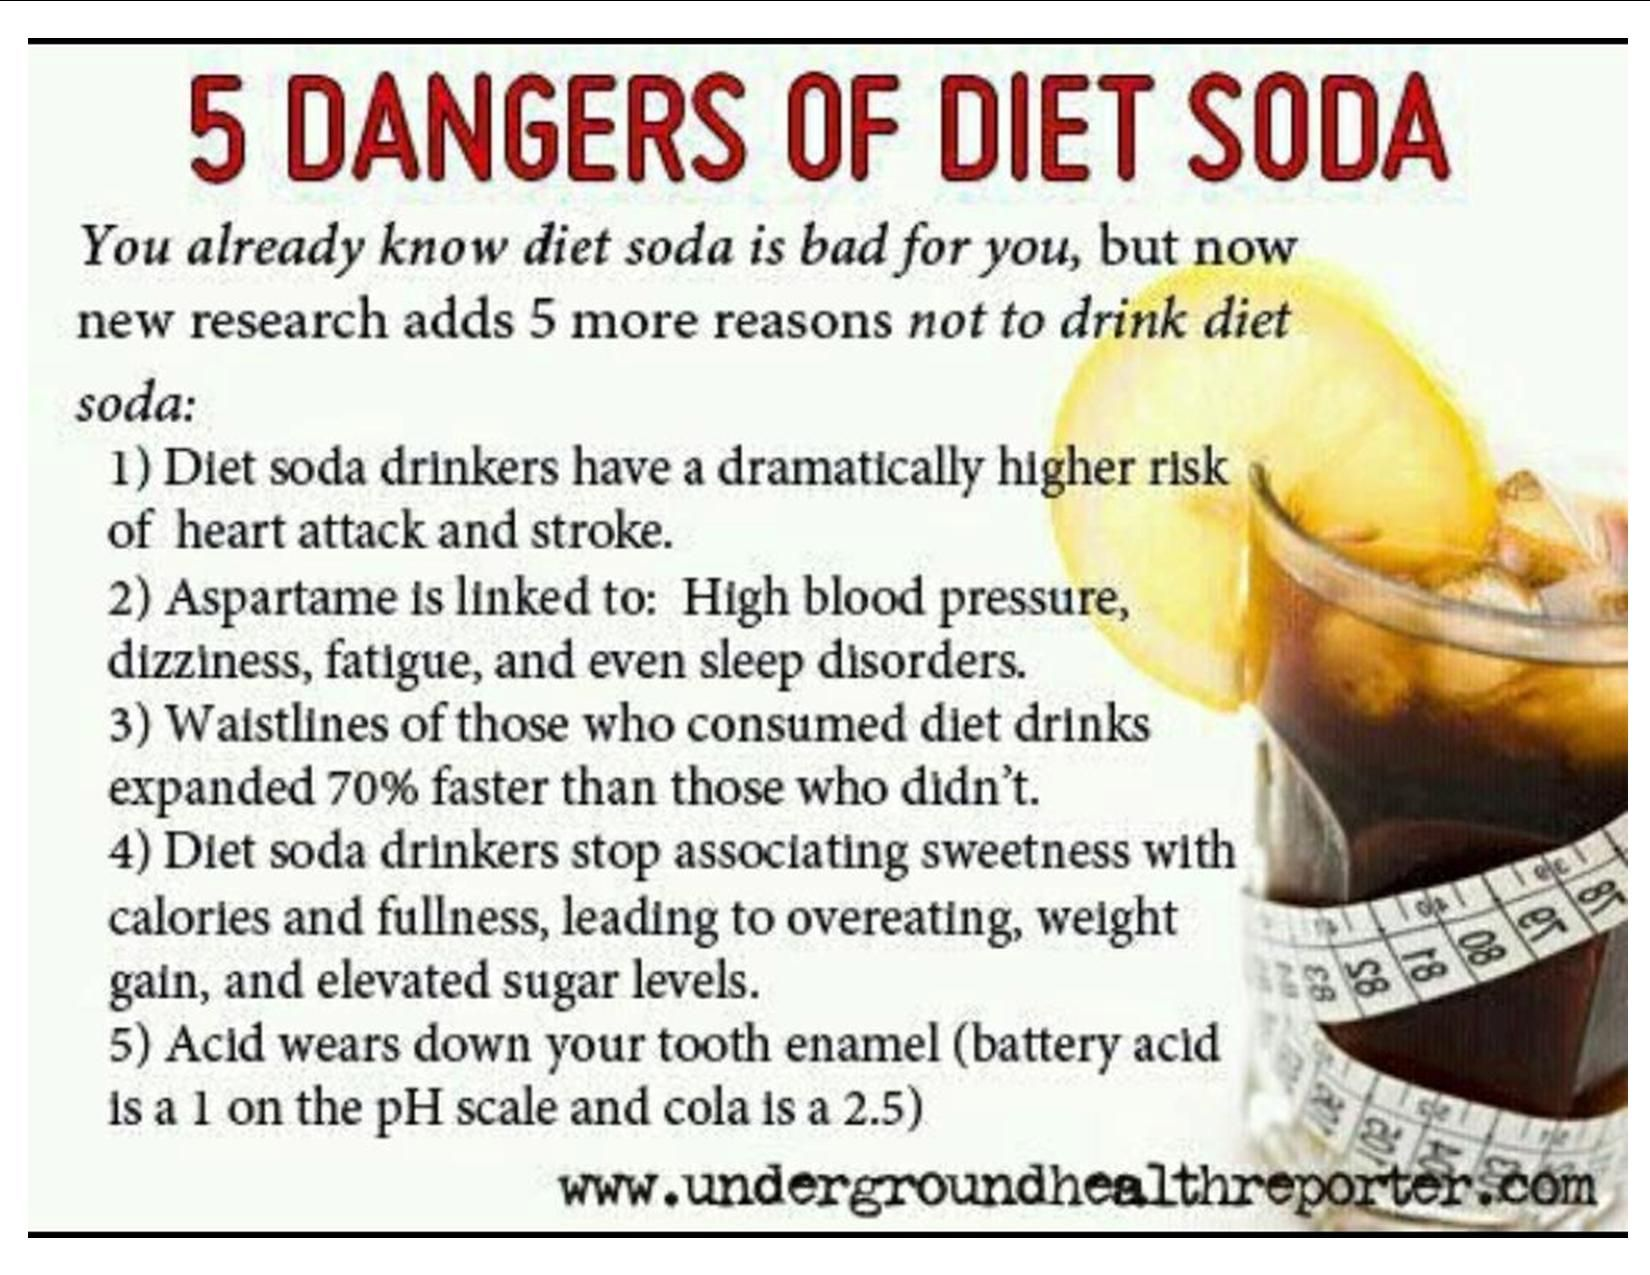 Three Main Dangers of Dieting